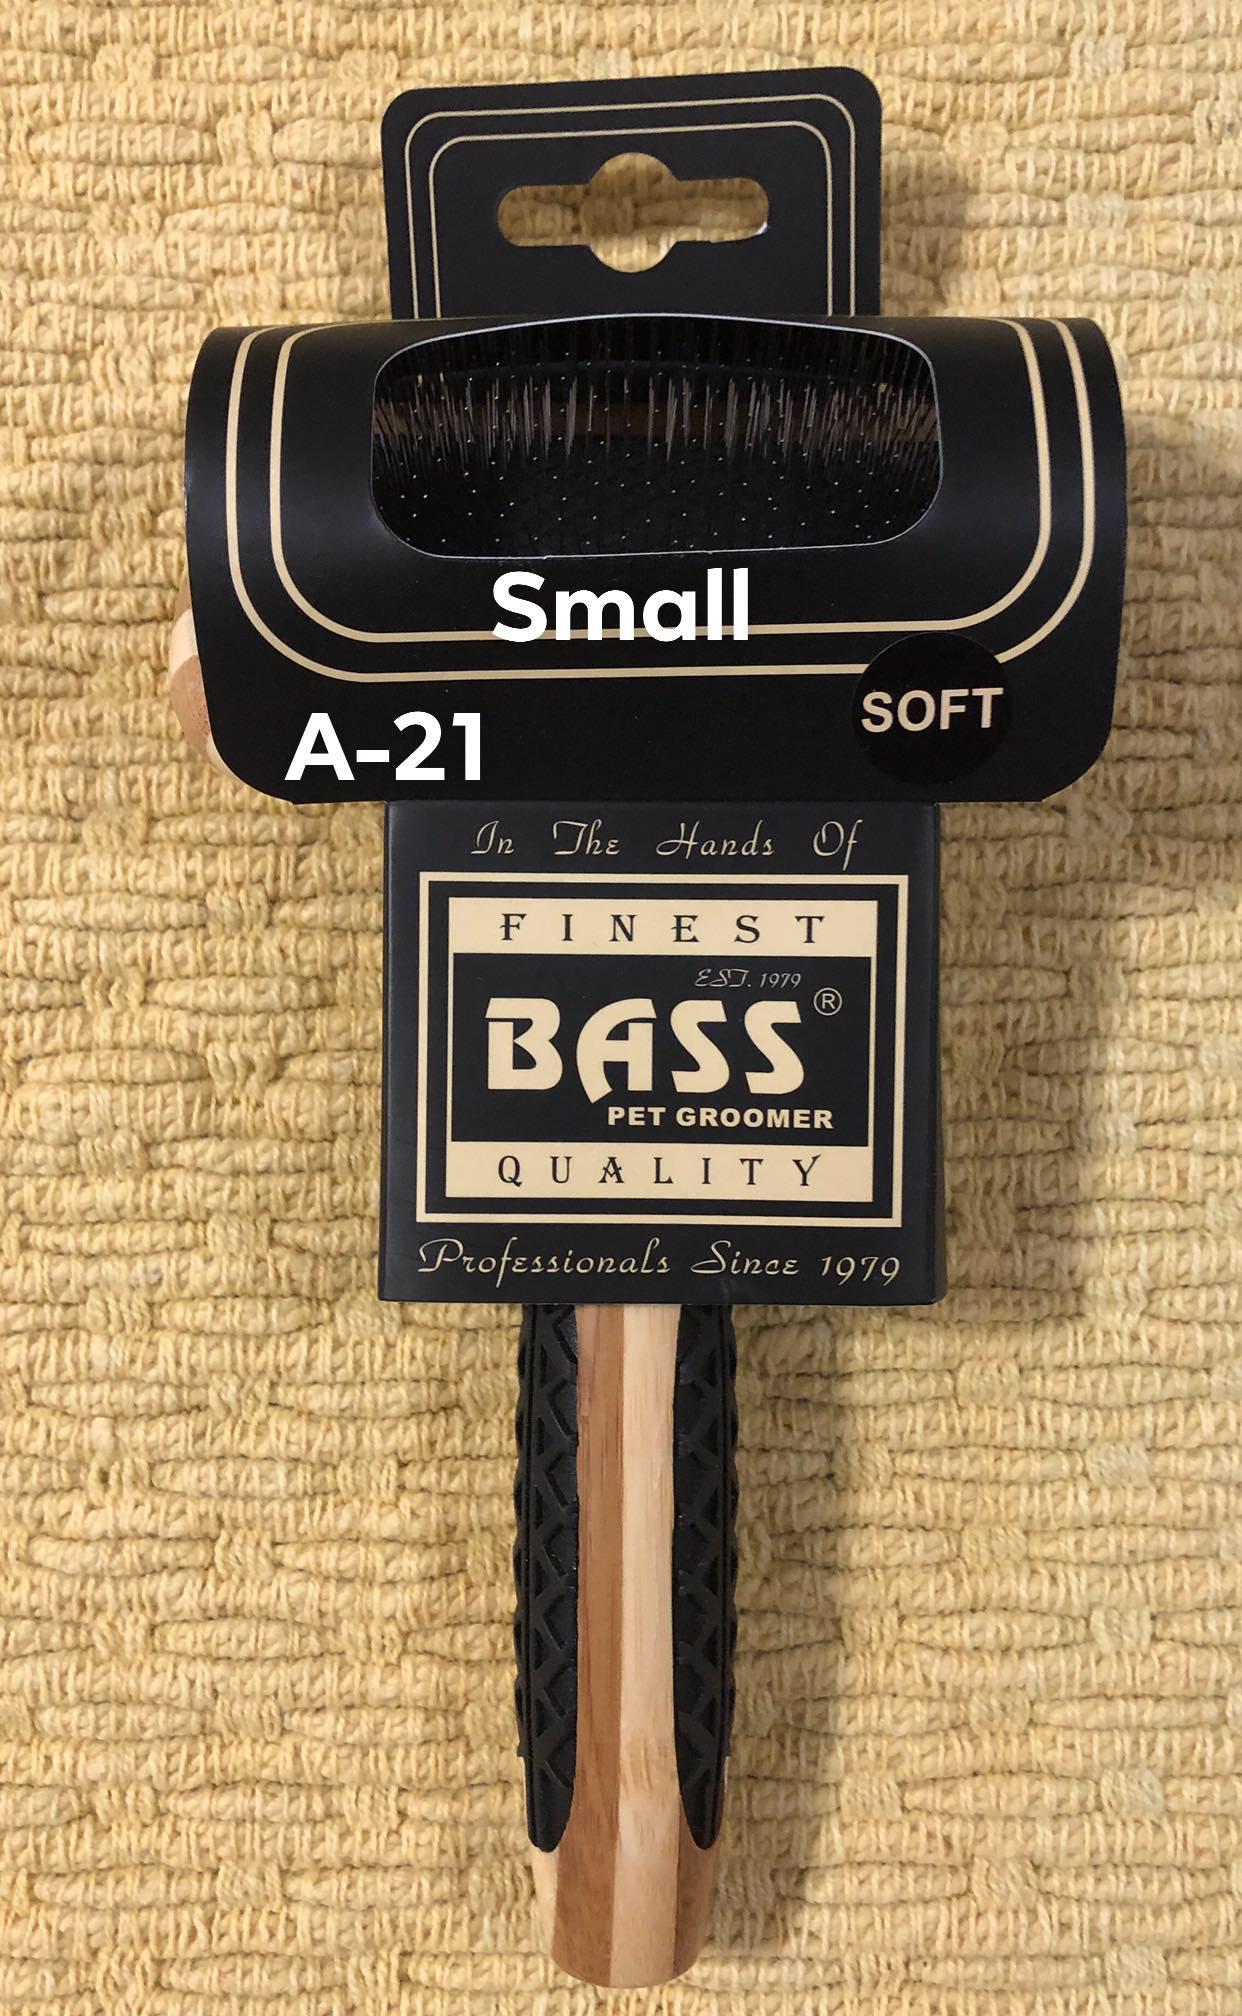 Bass A-21 Small Wet/Dry Bamboo Soft Slicker